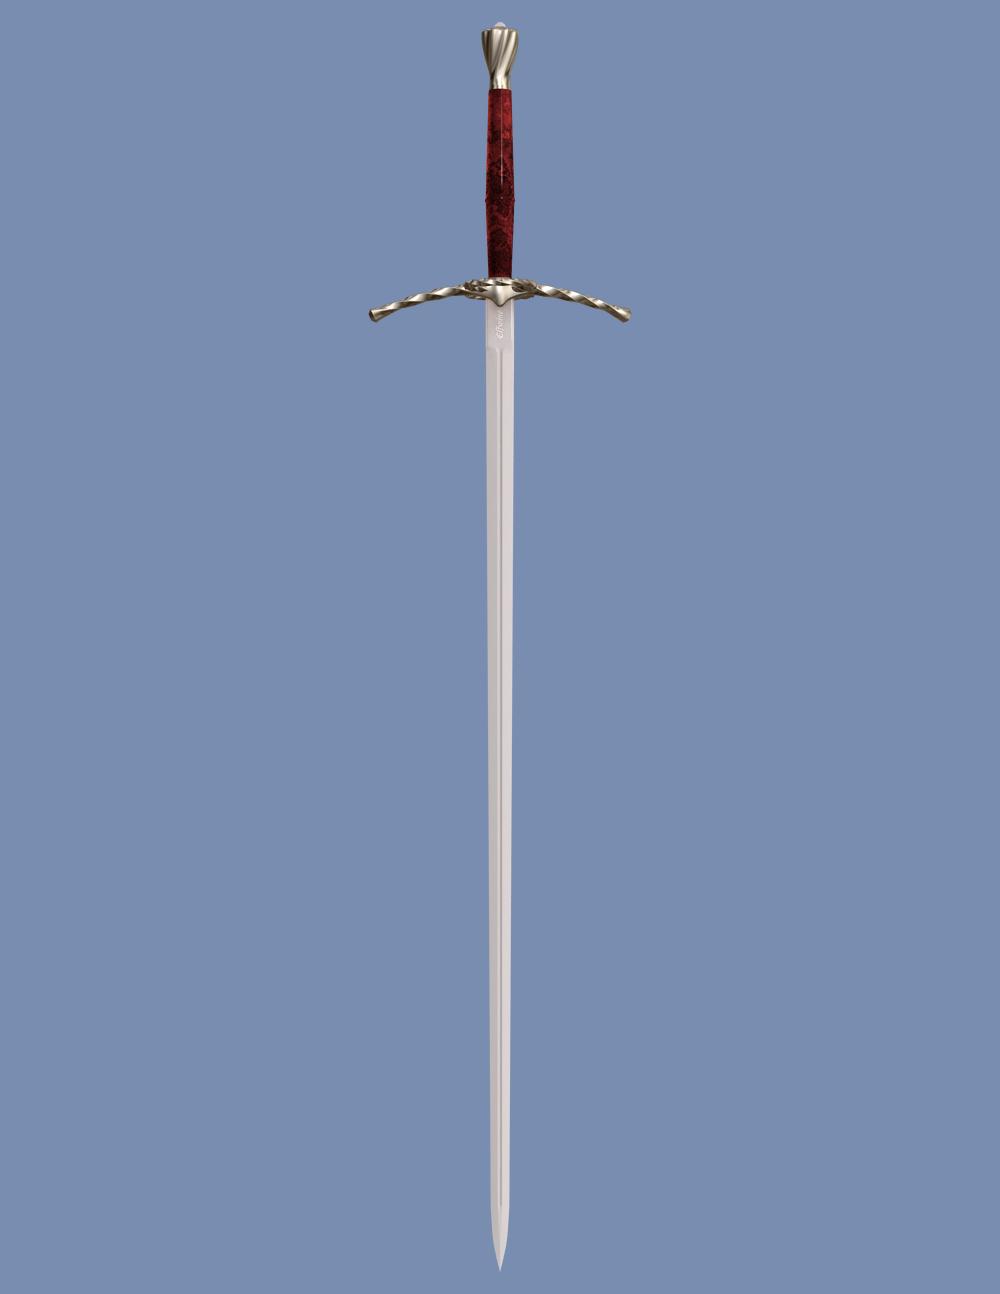 High Guard By Cgartiste On Deviantart Knight Sword Medieval Knight Guard